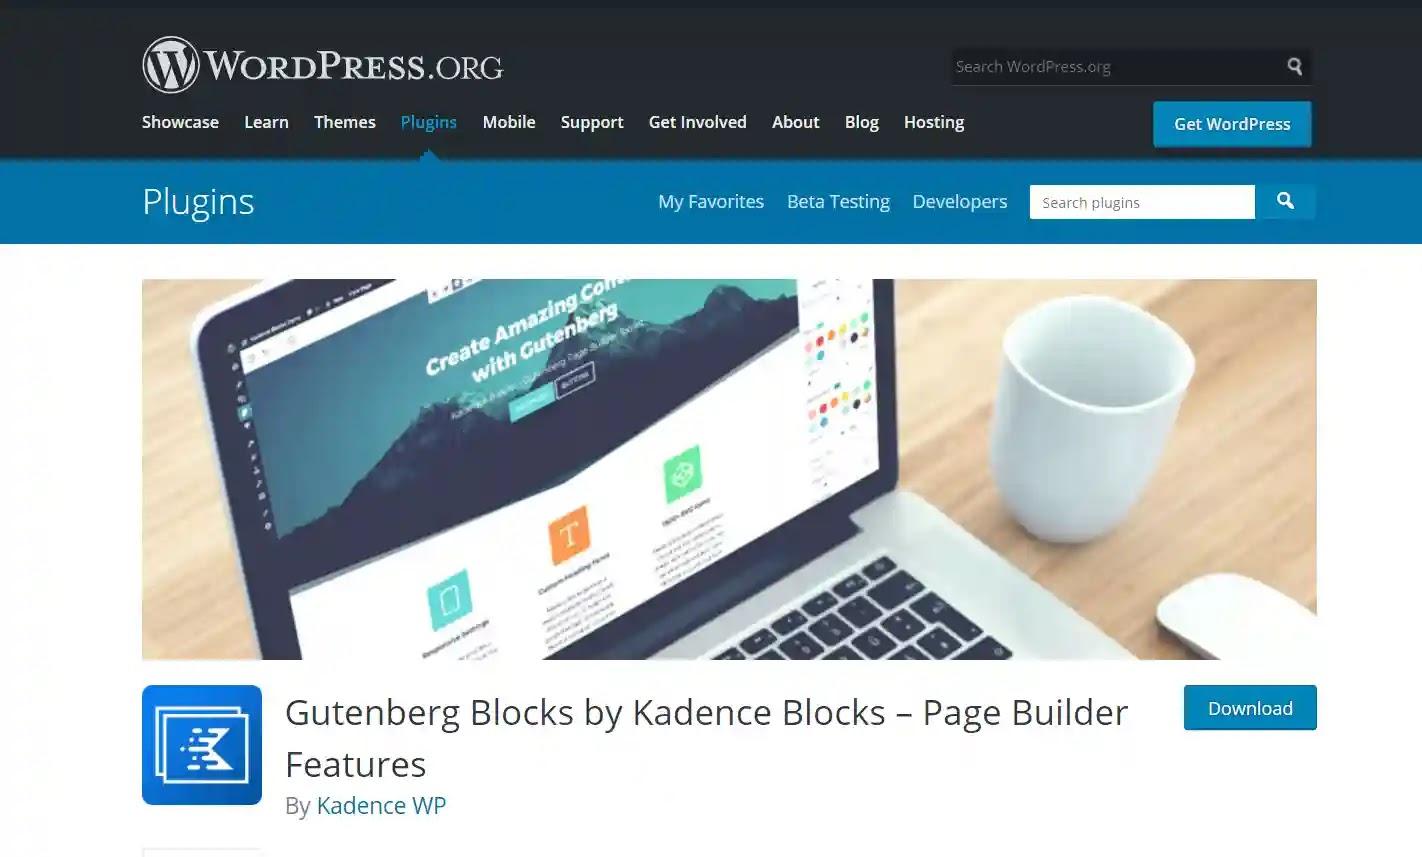 Gutenberg Blocks by Kadence Blocks – Page Builder Features